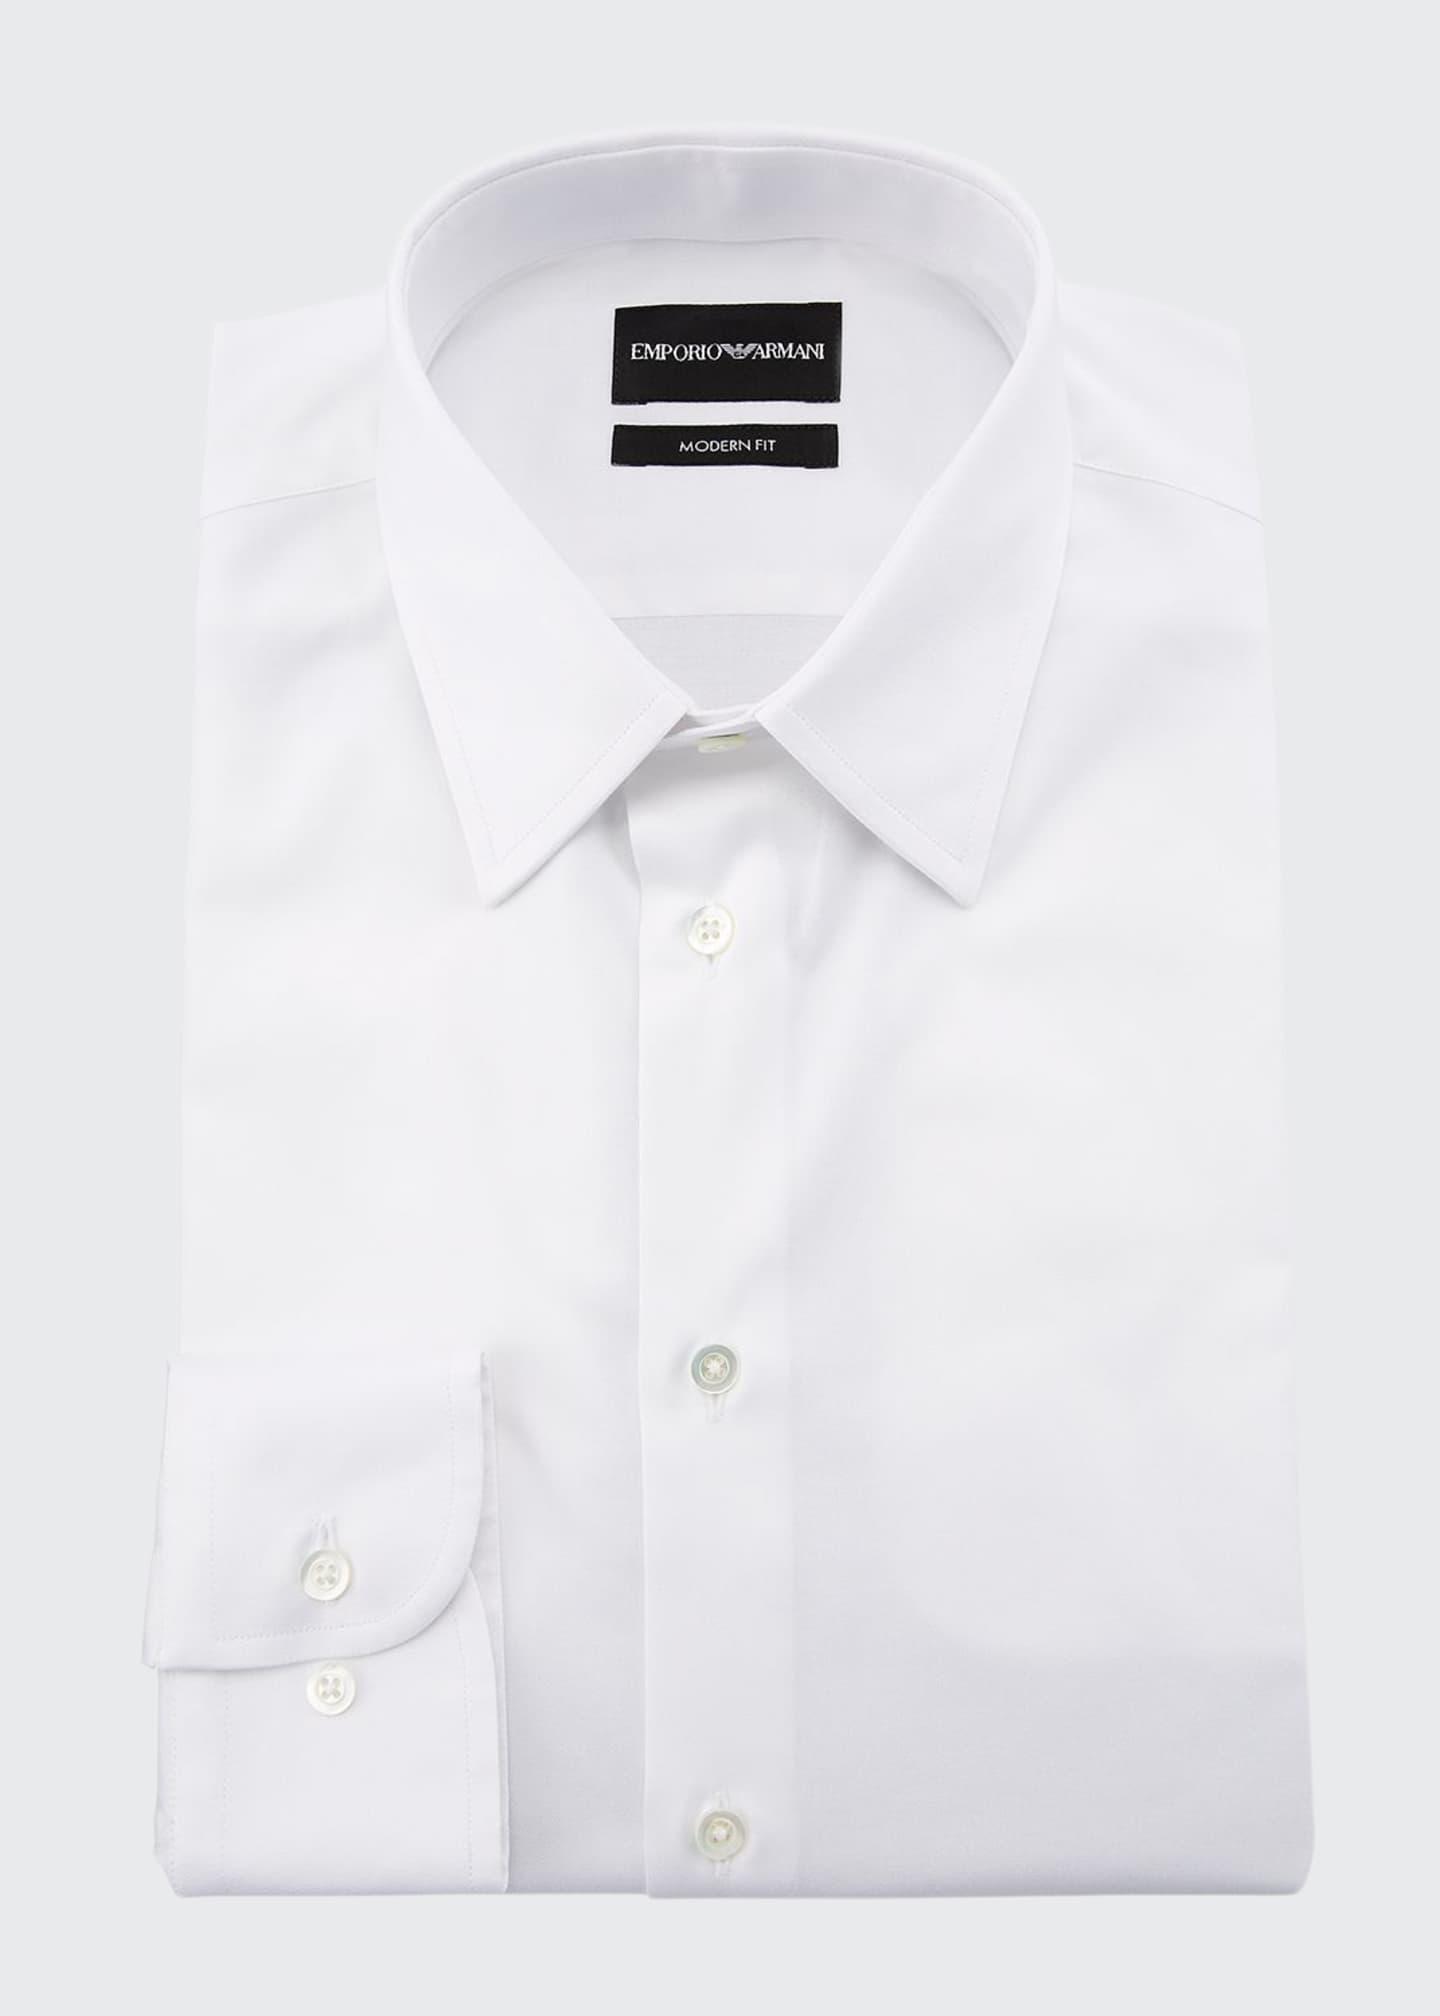 Emporio Armani Men's Modern-Fit Cotton-Stretch Dress Shirt, White